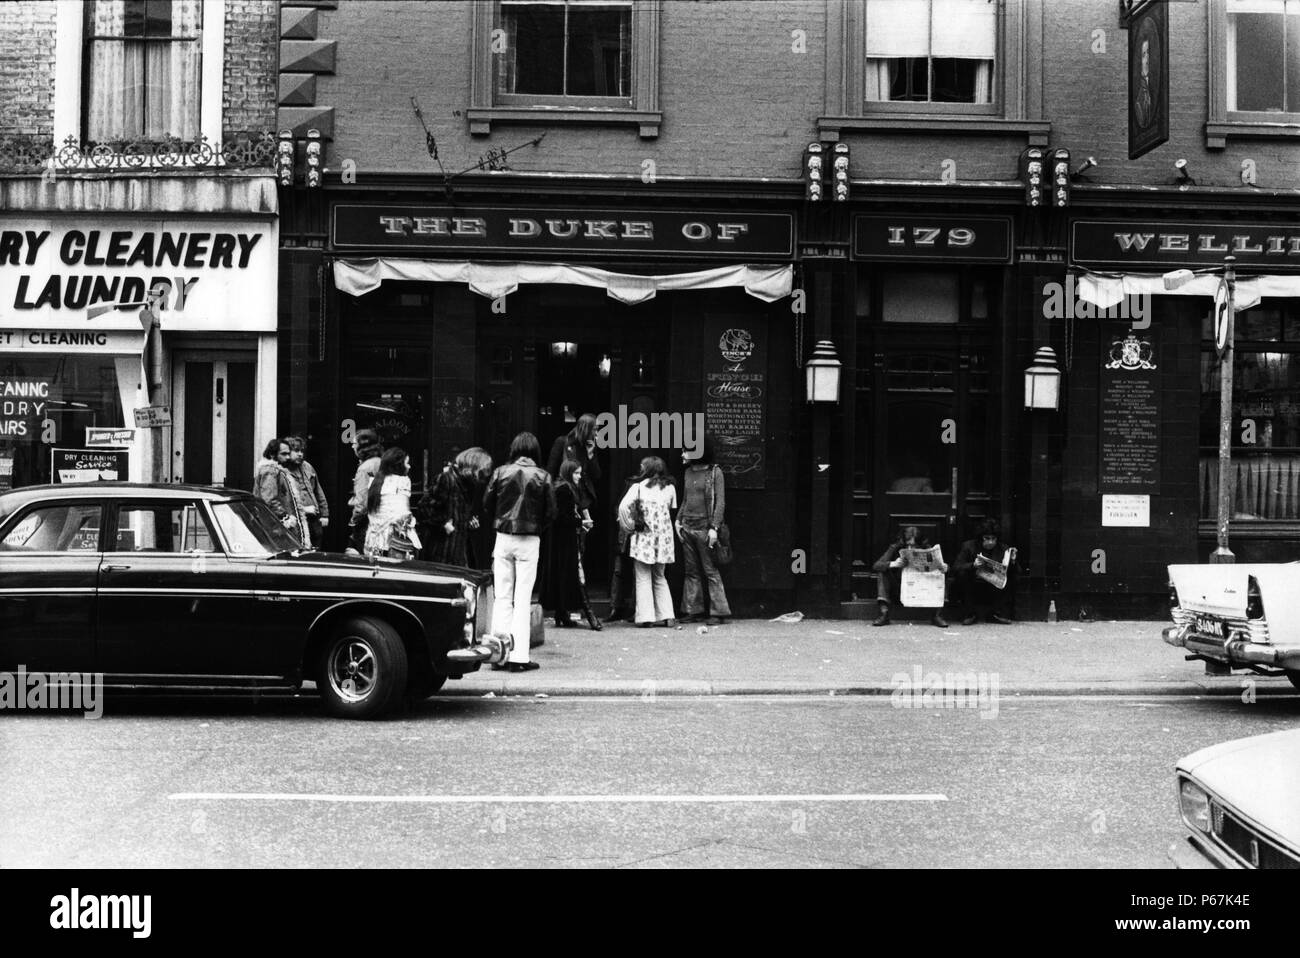 Duke of wellington pub 1970's - Stock Image